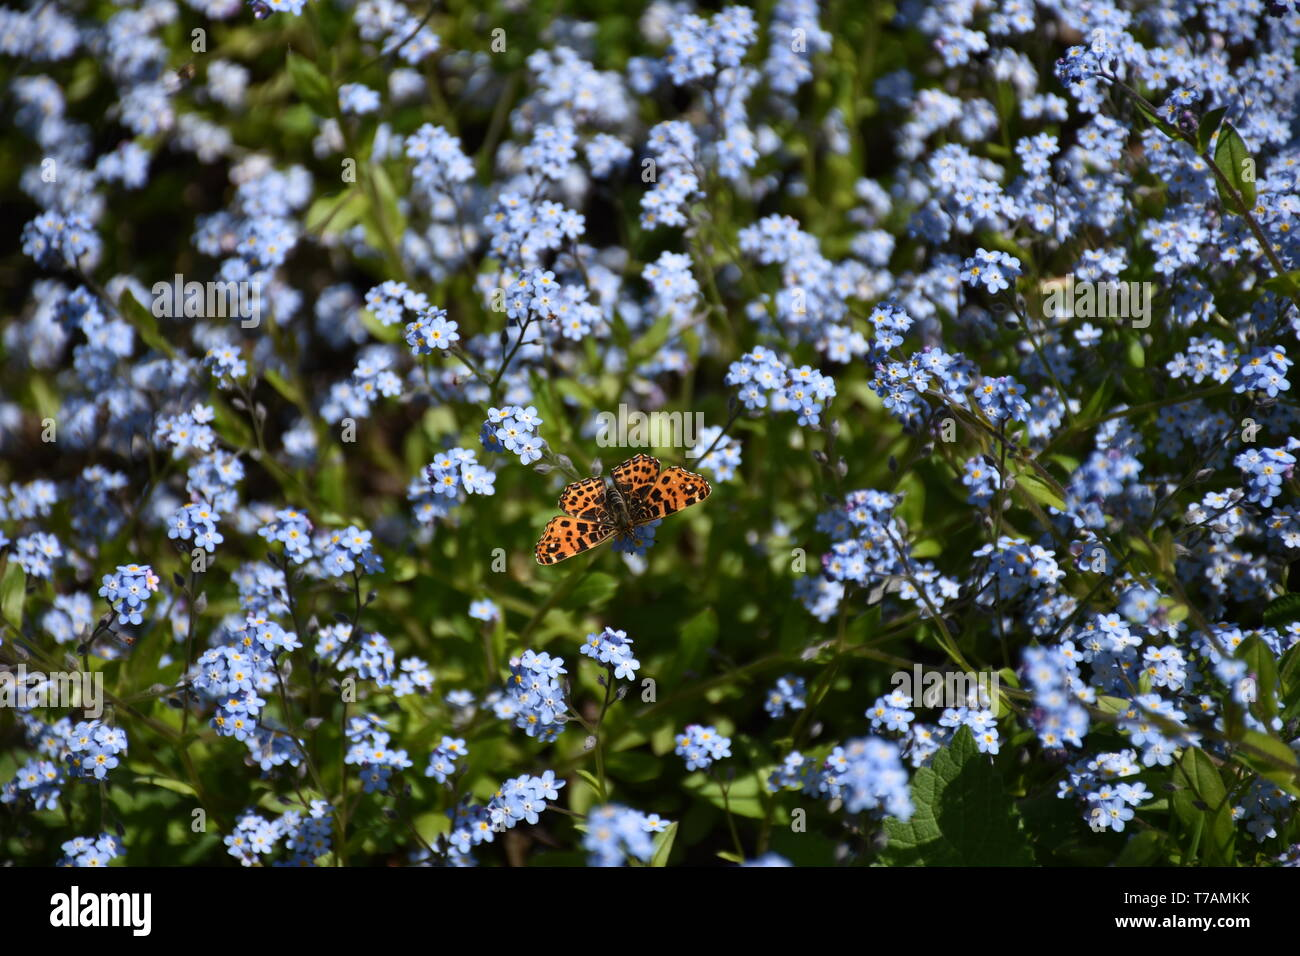 Vanessa cardui, Distelfalter, edelfalter, Falter, Saugrüssel, Rüssel, Schmetterling, Lepidoptera, Flügel, Muster, Blume, Blüte, Blumen, Sonne, Wiesen Stockbild